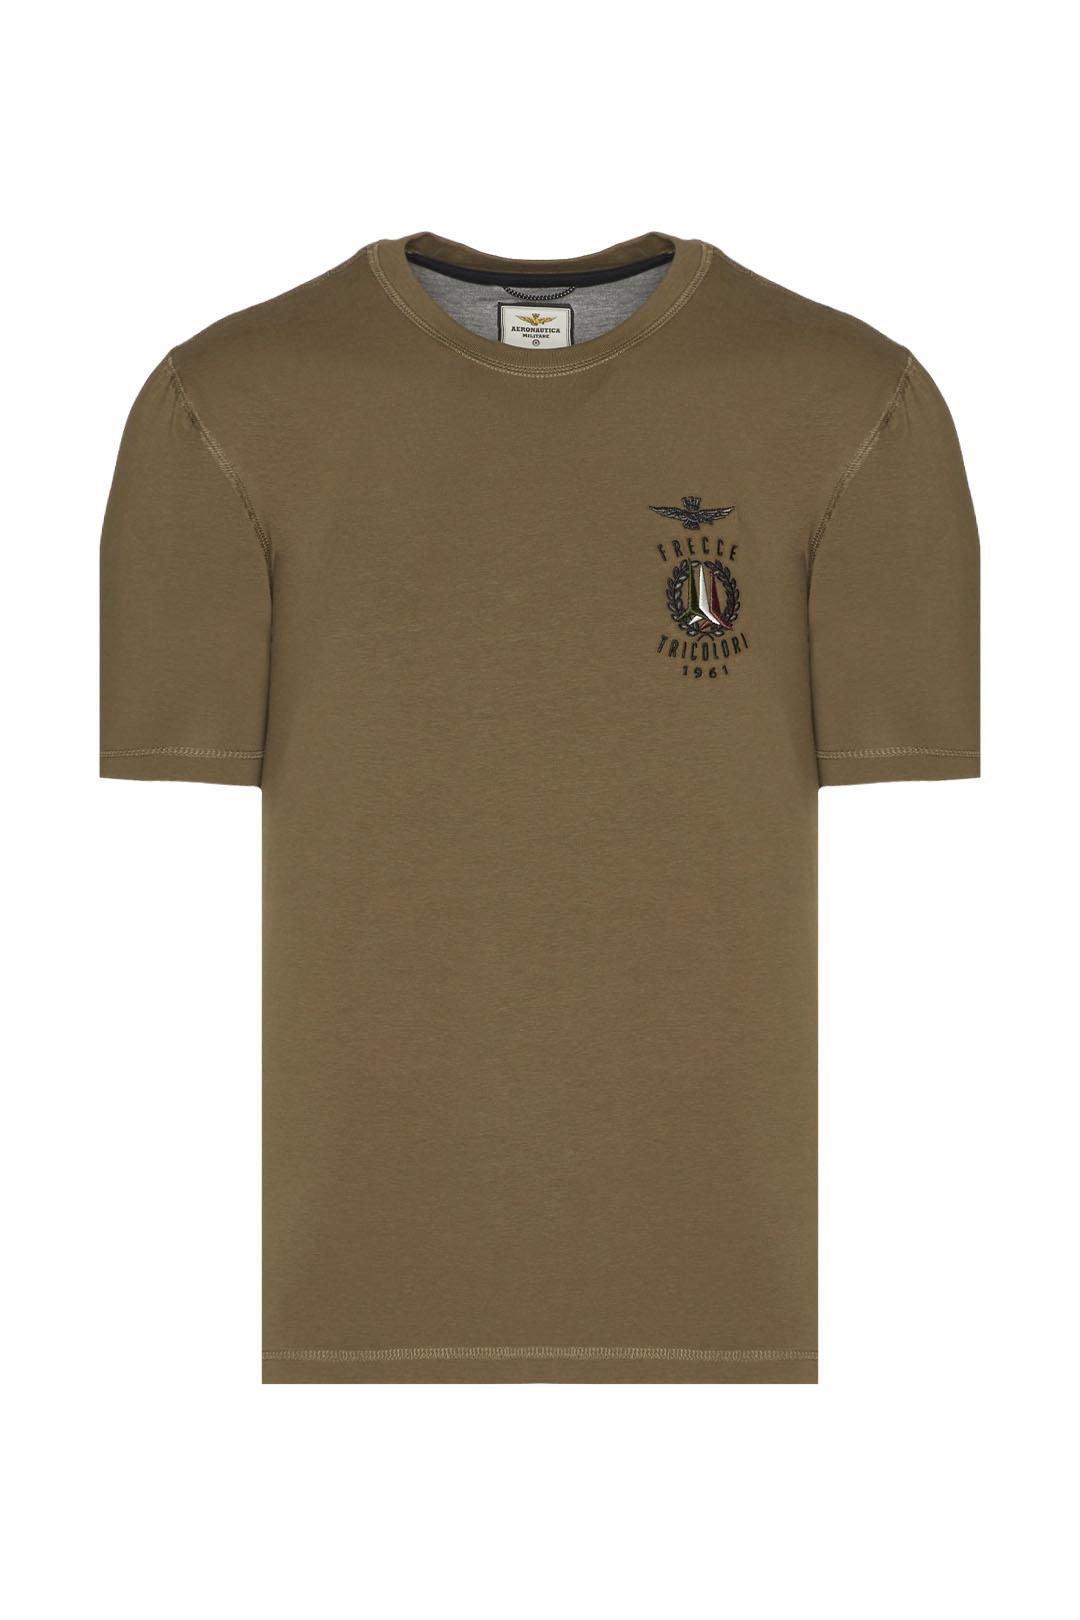 Frecce Tricolori short-sleeved t-shirt   1